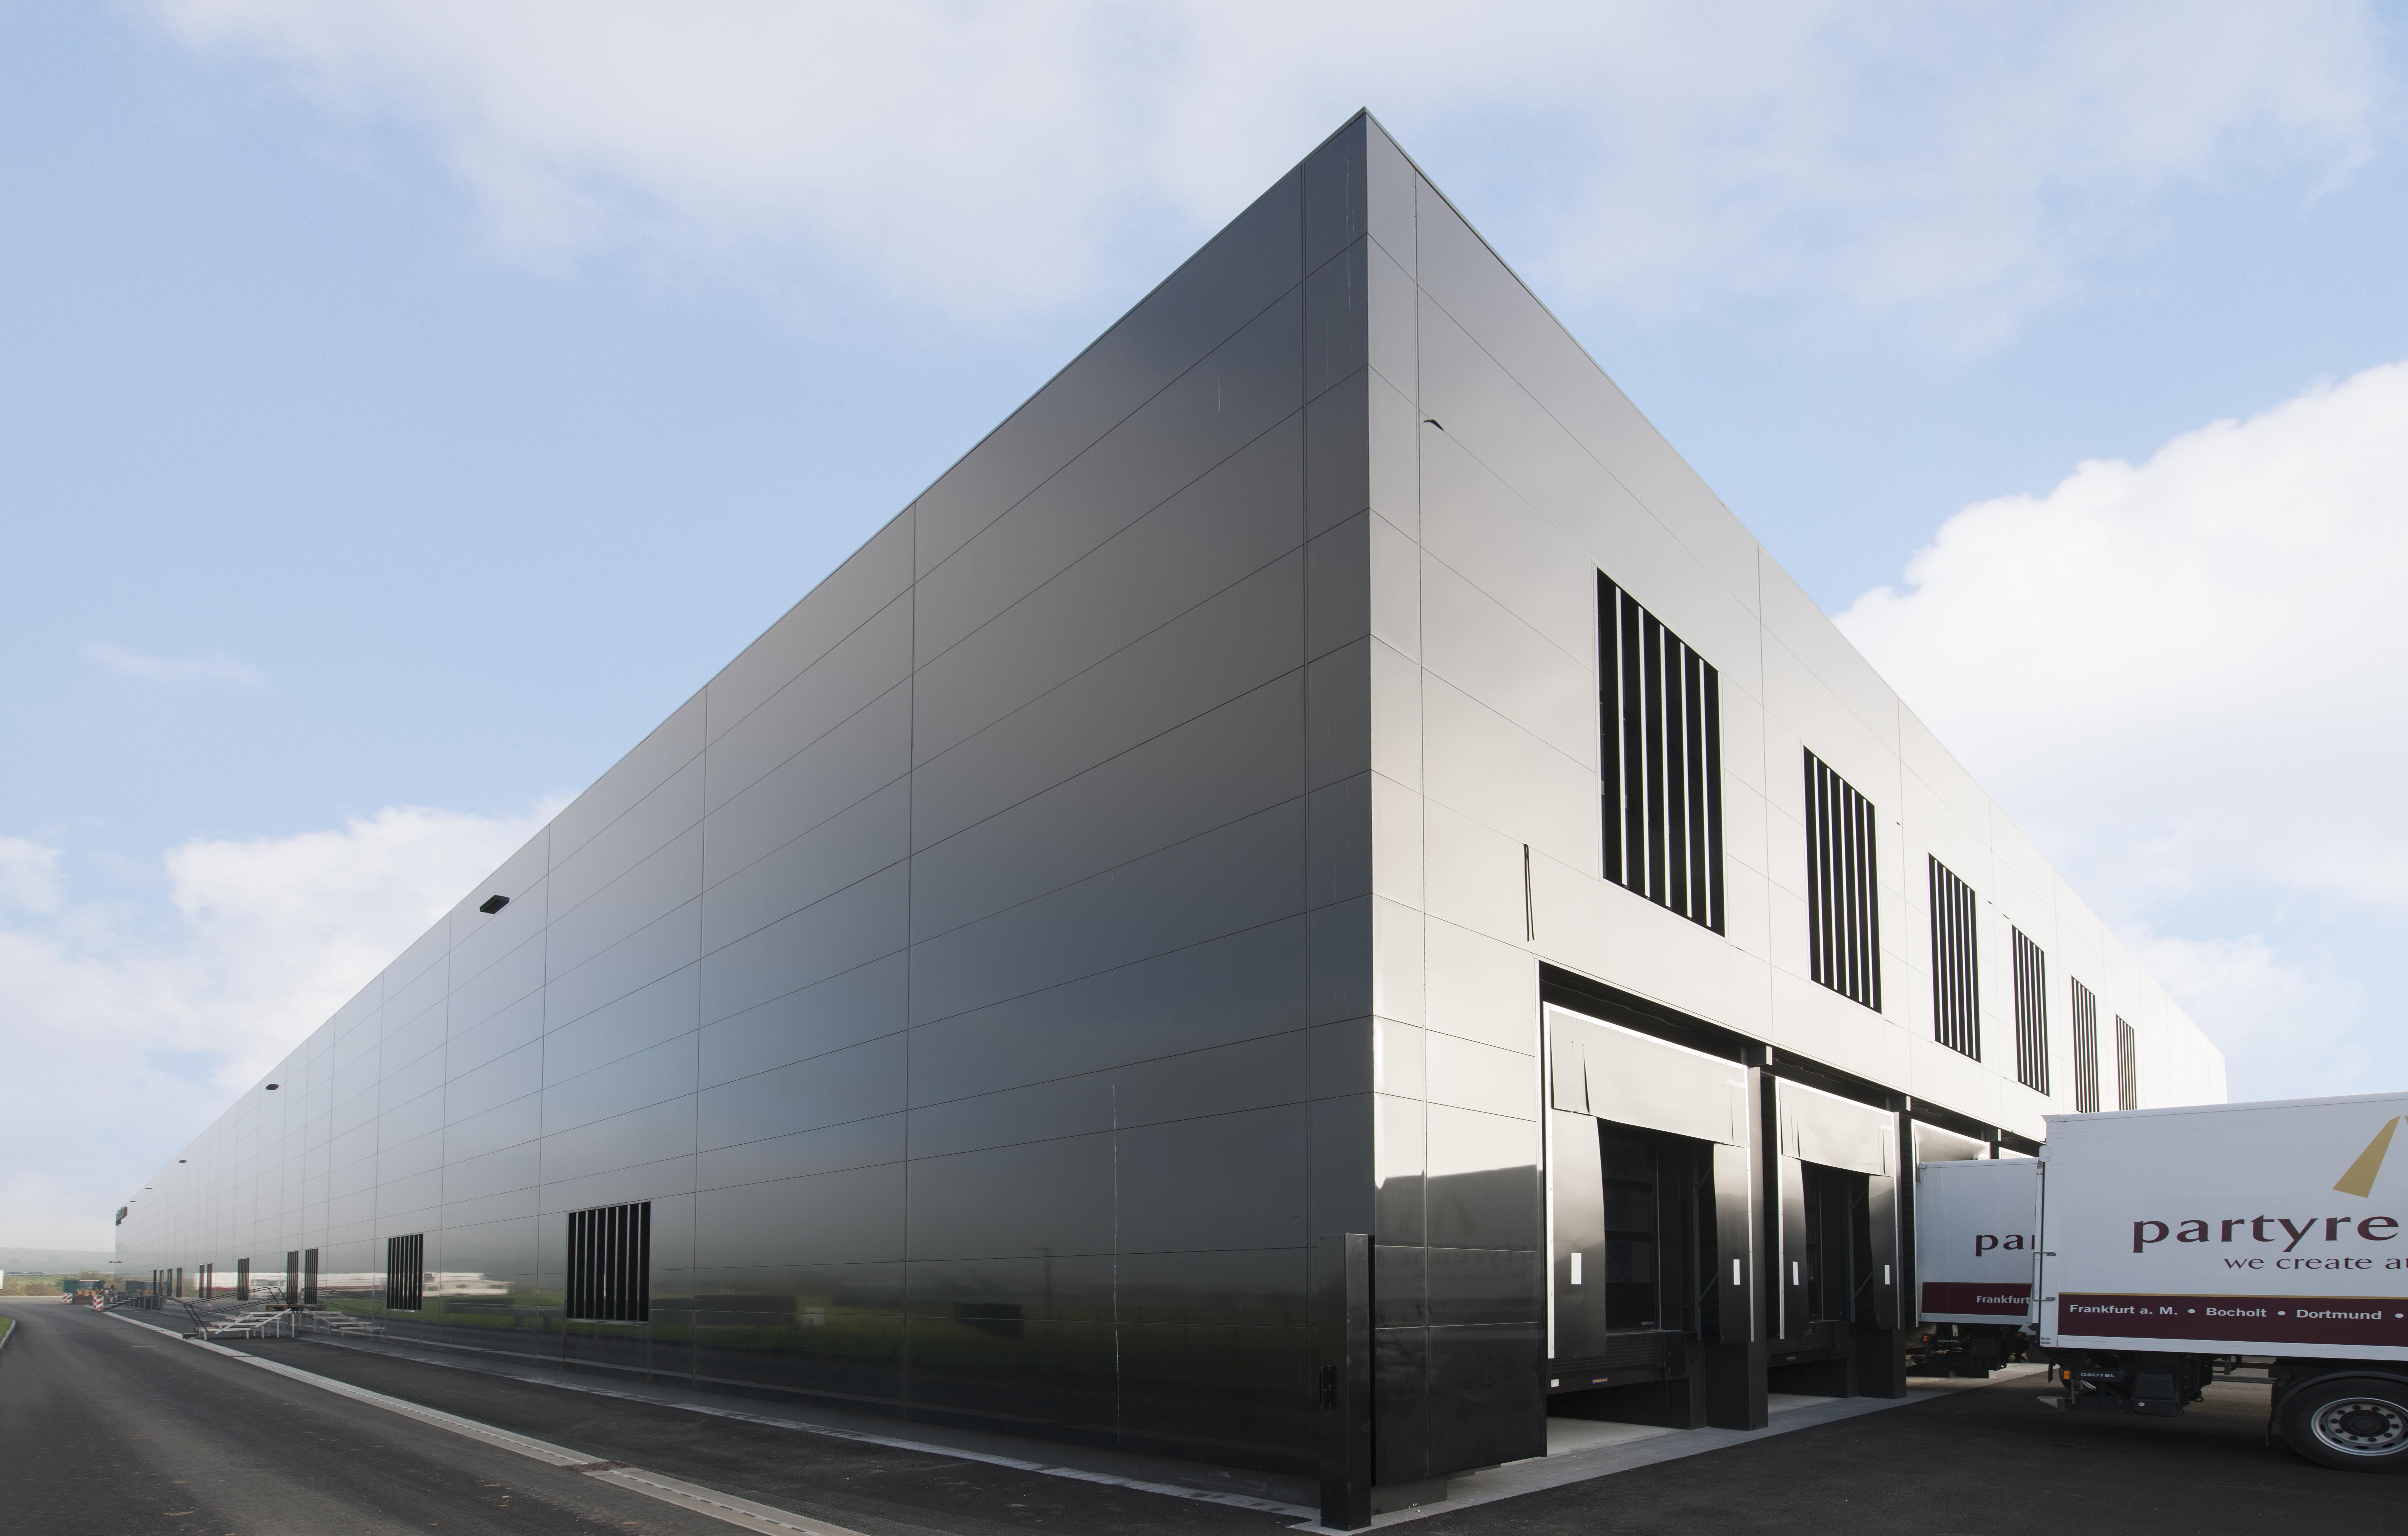 Nestlé Nespresso Avenches, Production and distribution centre